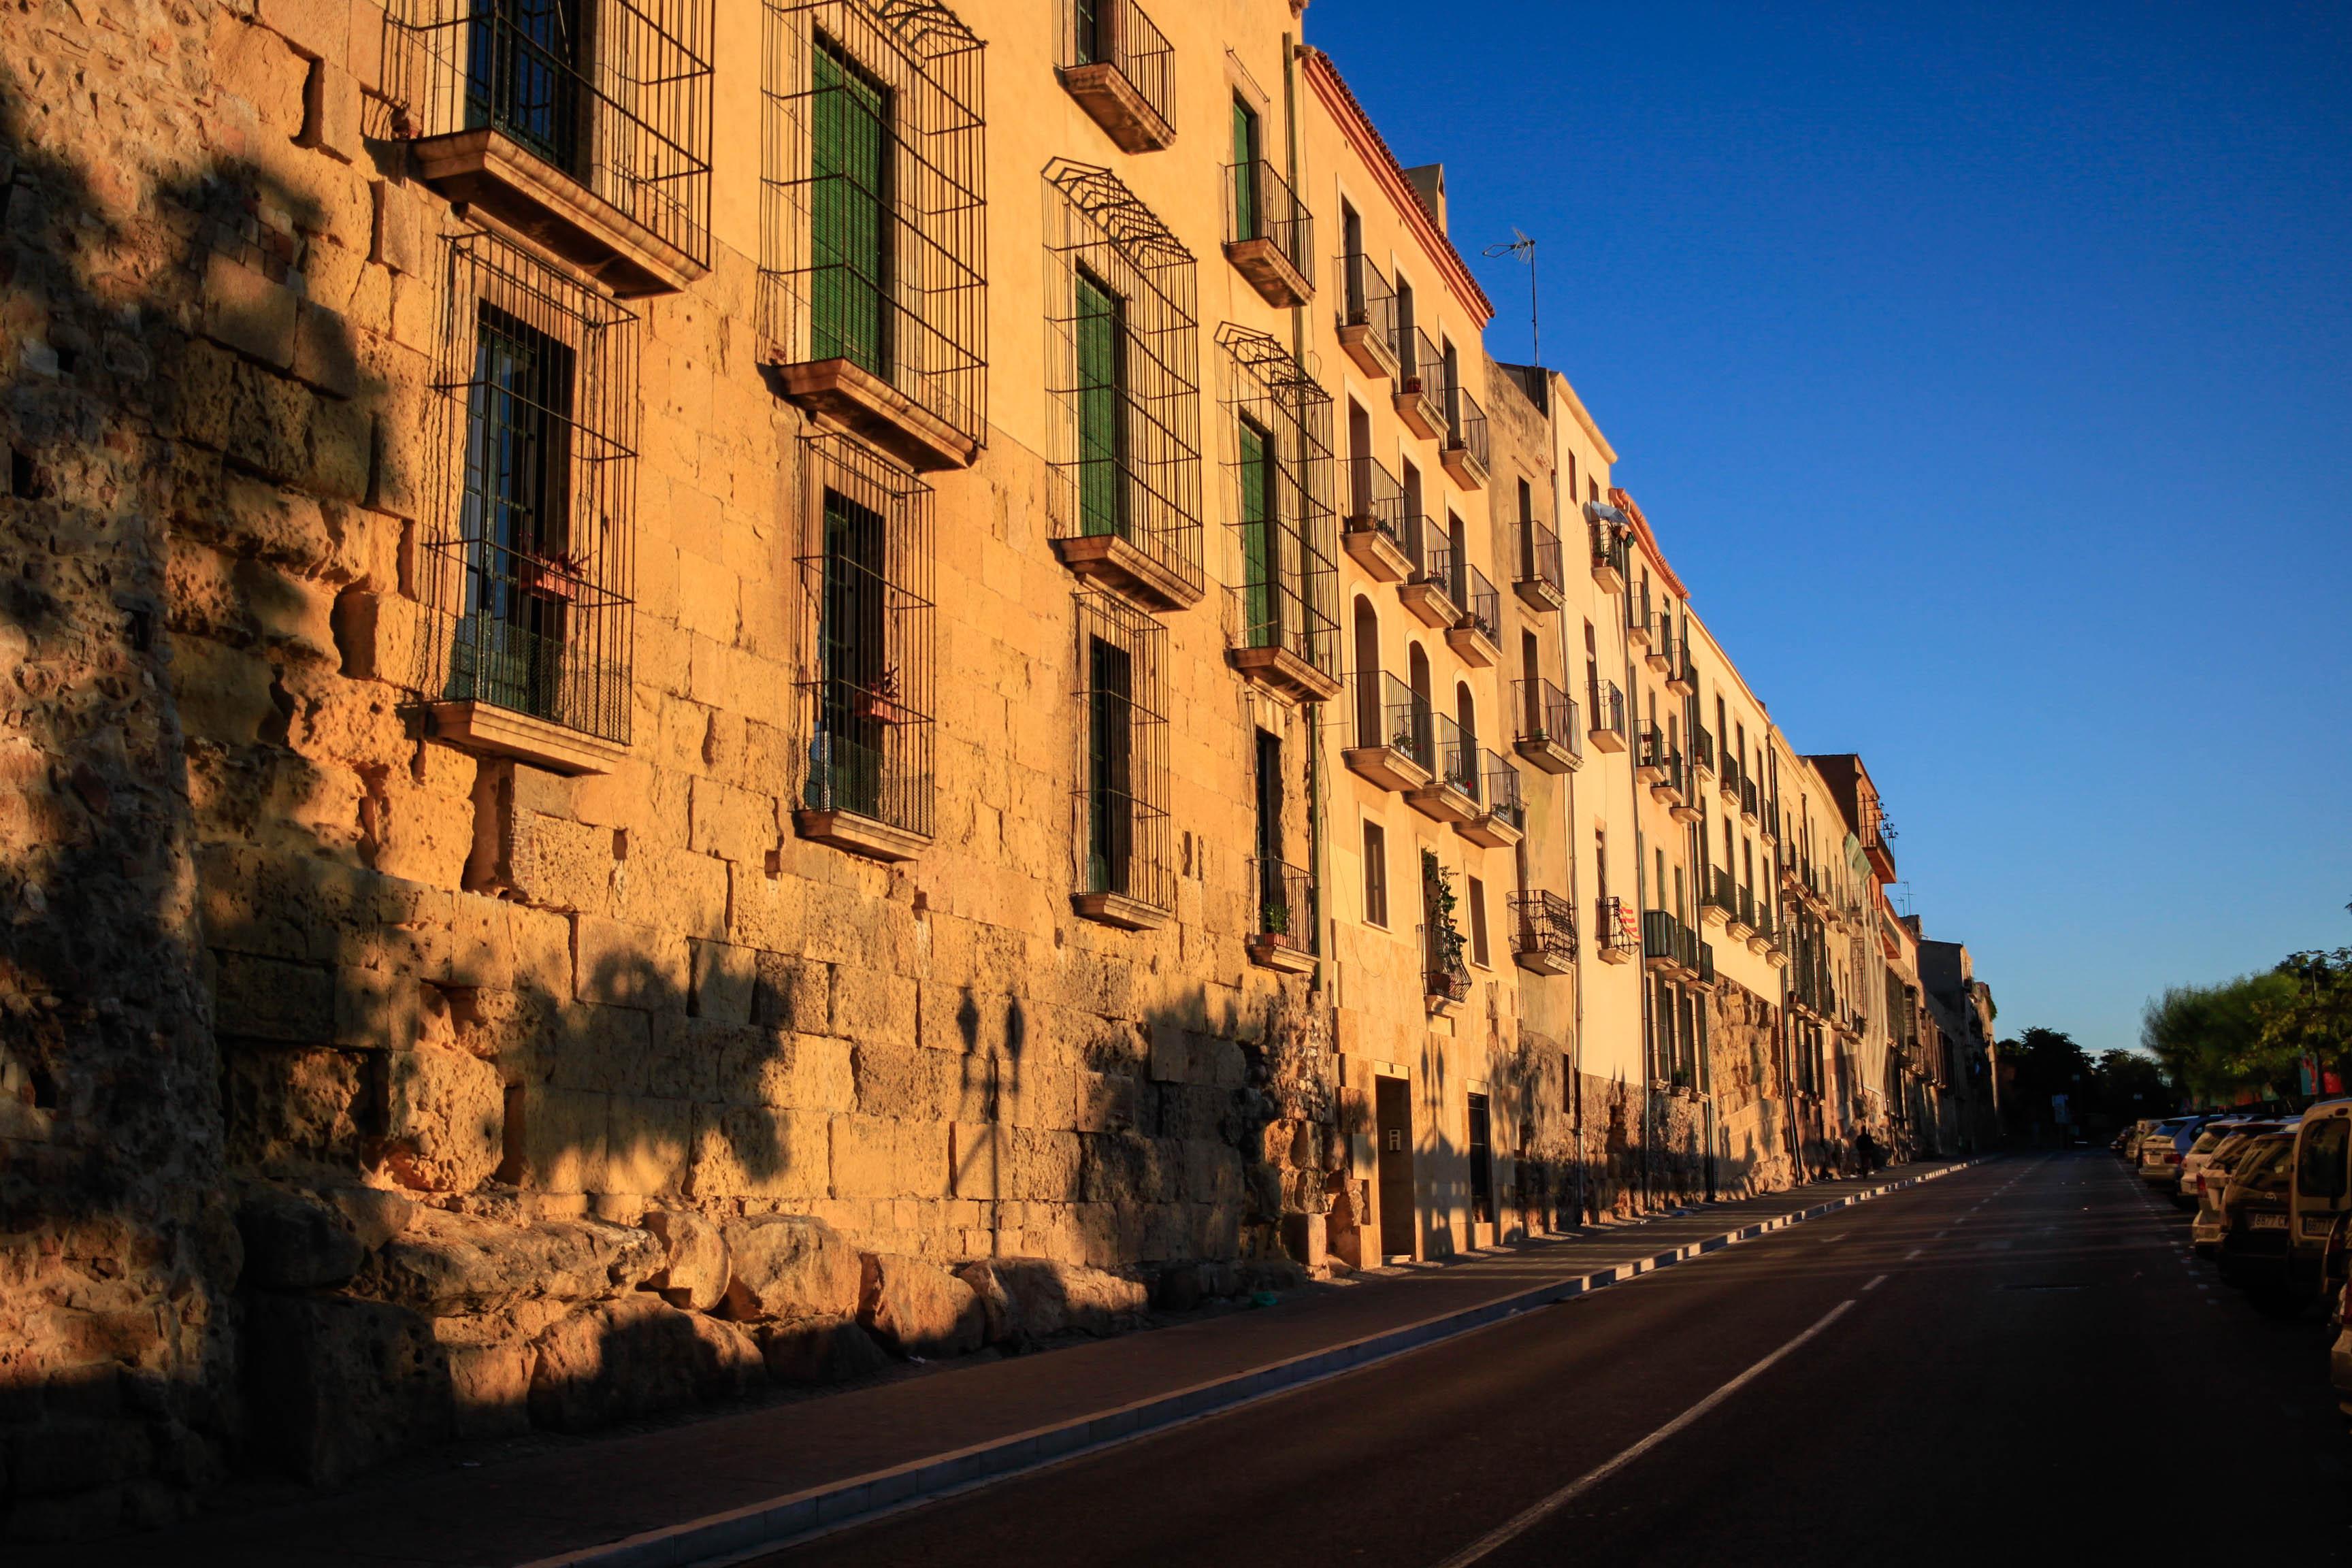 Cases situades a la muralla de Sant Antoni